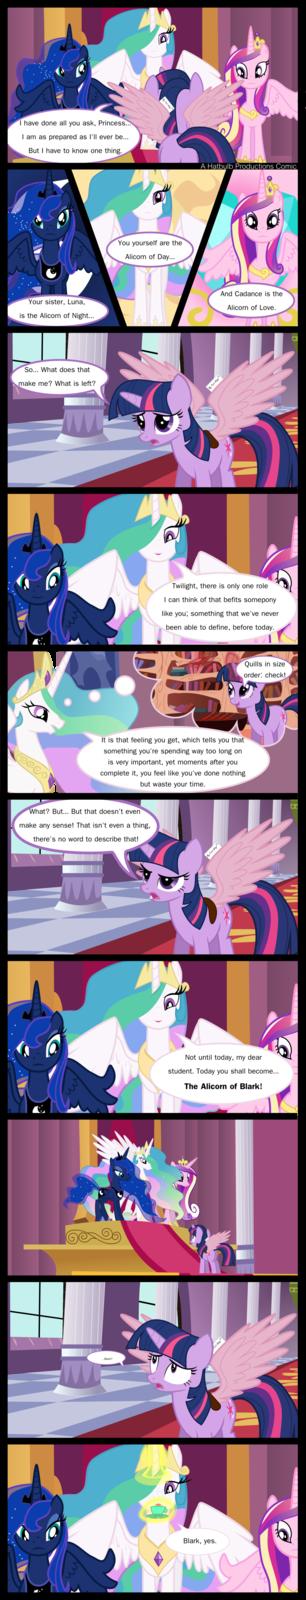 Twilight's Ascension: Blark